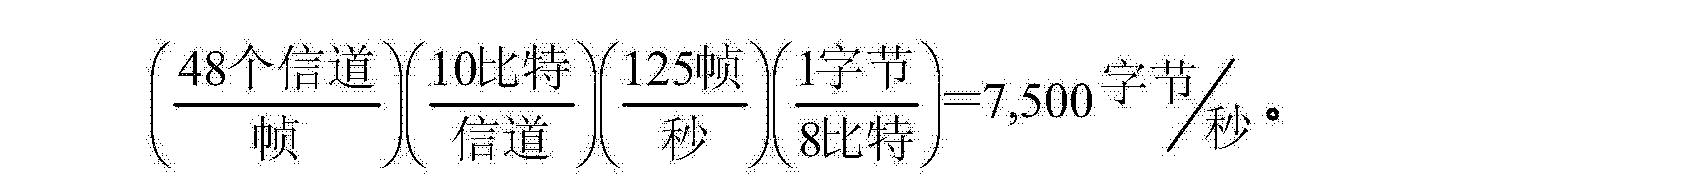 Figure CN104407796AD00061